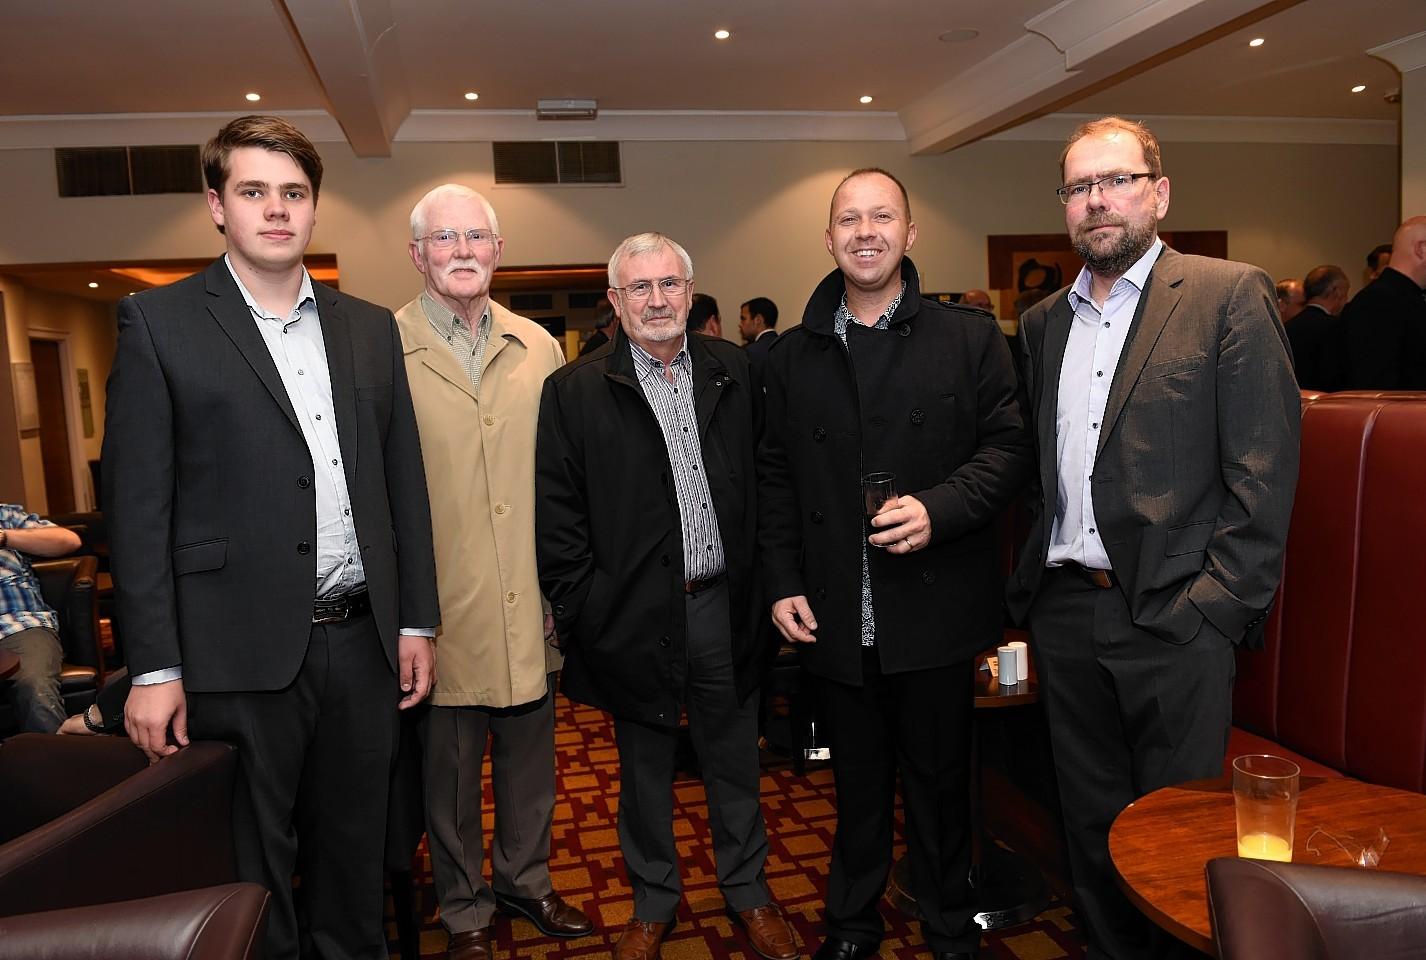 Matthew Wilson, Hamish McLeod, Jim Johnston, Derek Morris and Stuart Wilson